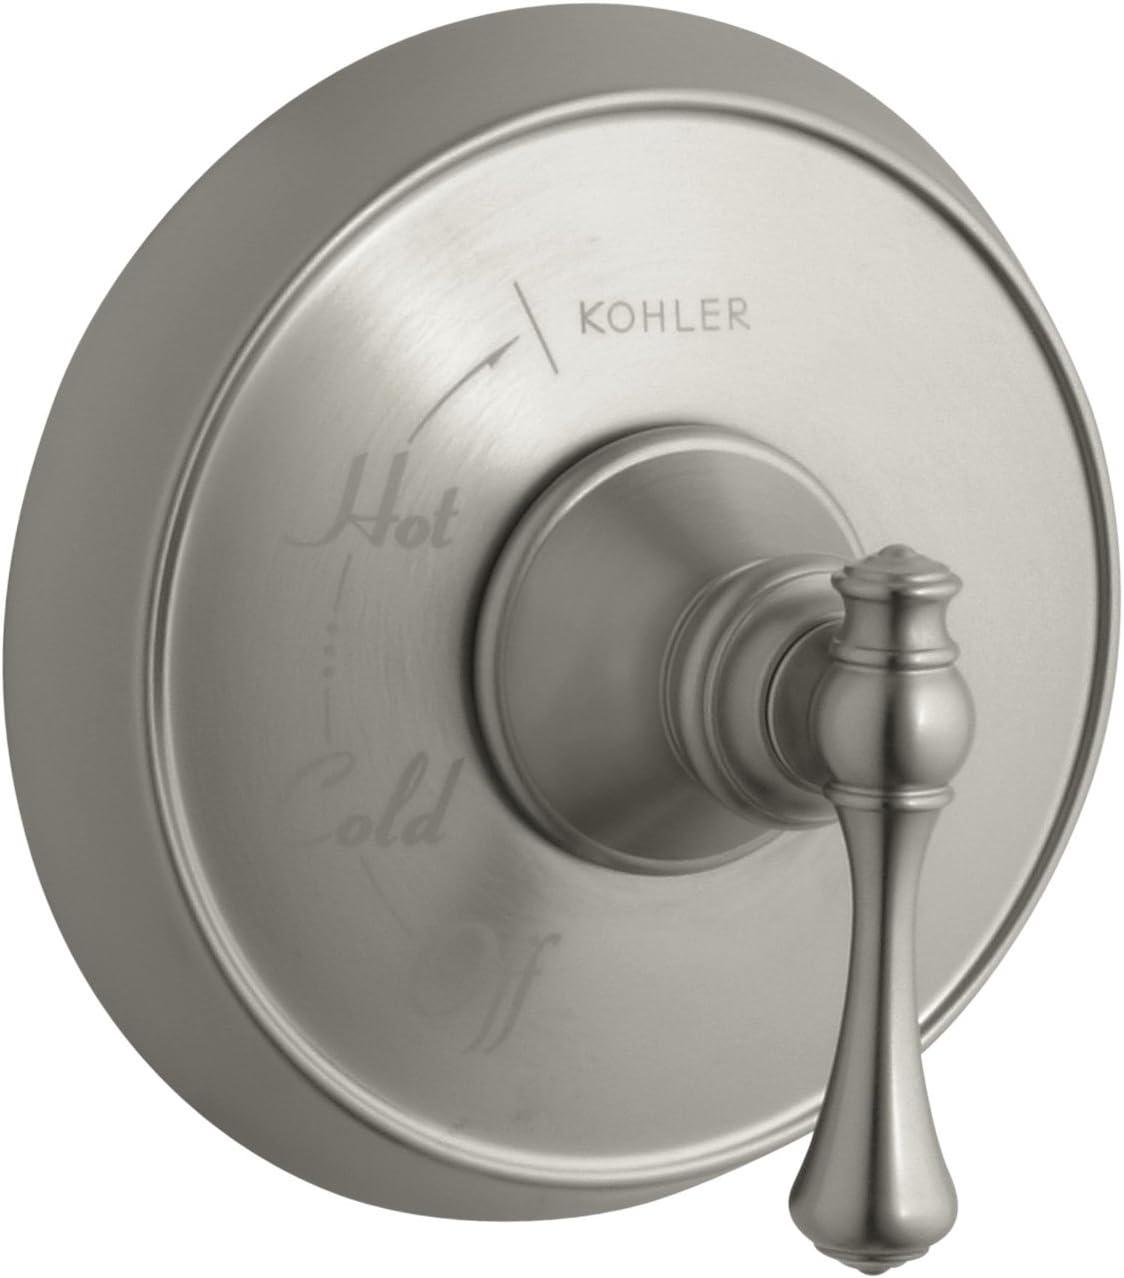 Kohler K T16117 4a Bn Revival Rite Temp Pressure Balancing Valve Trim Vibrant Brushed Nickel Tools Home Improvement Amazon Canada